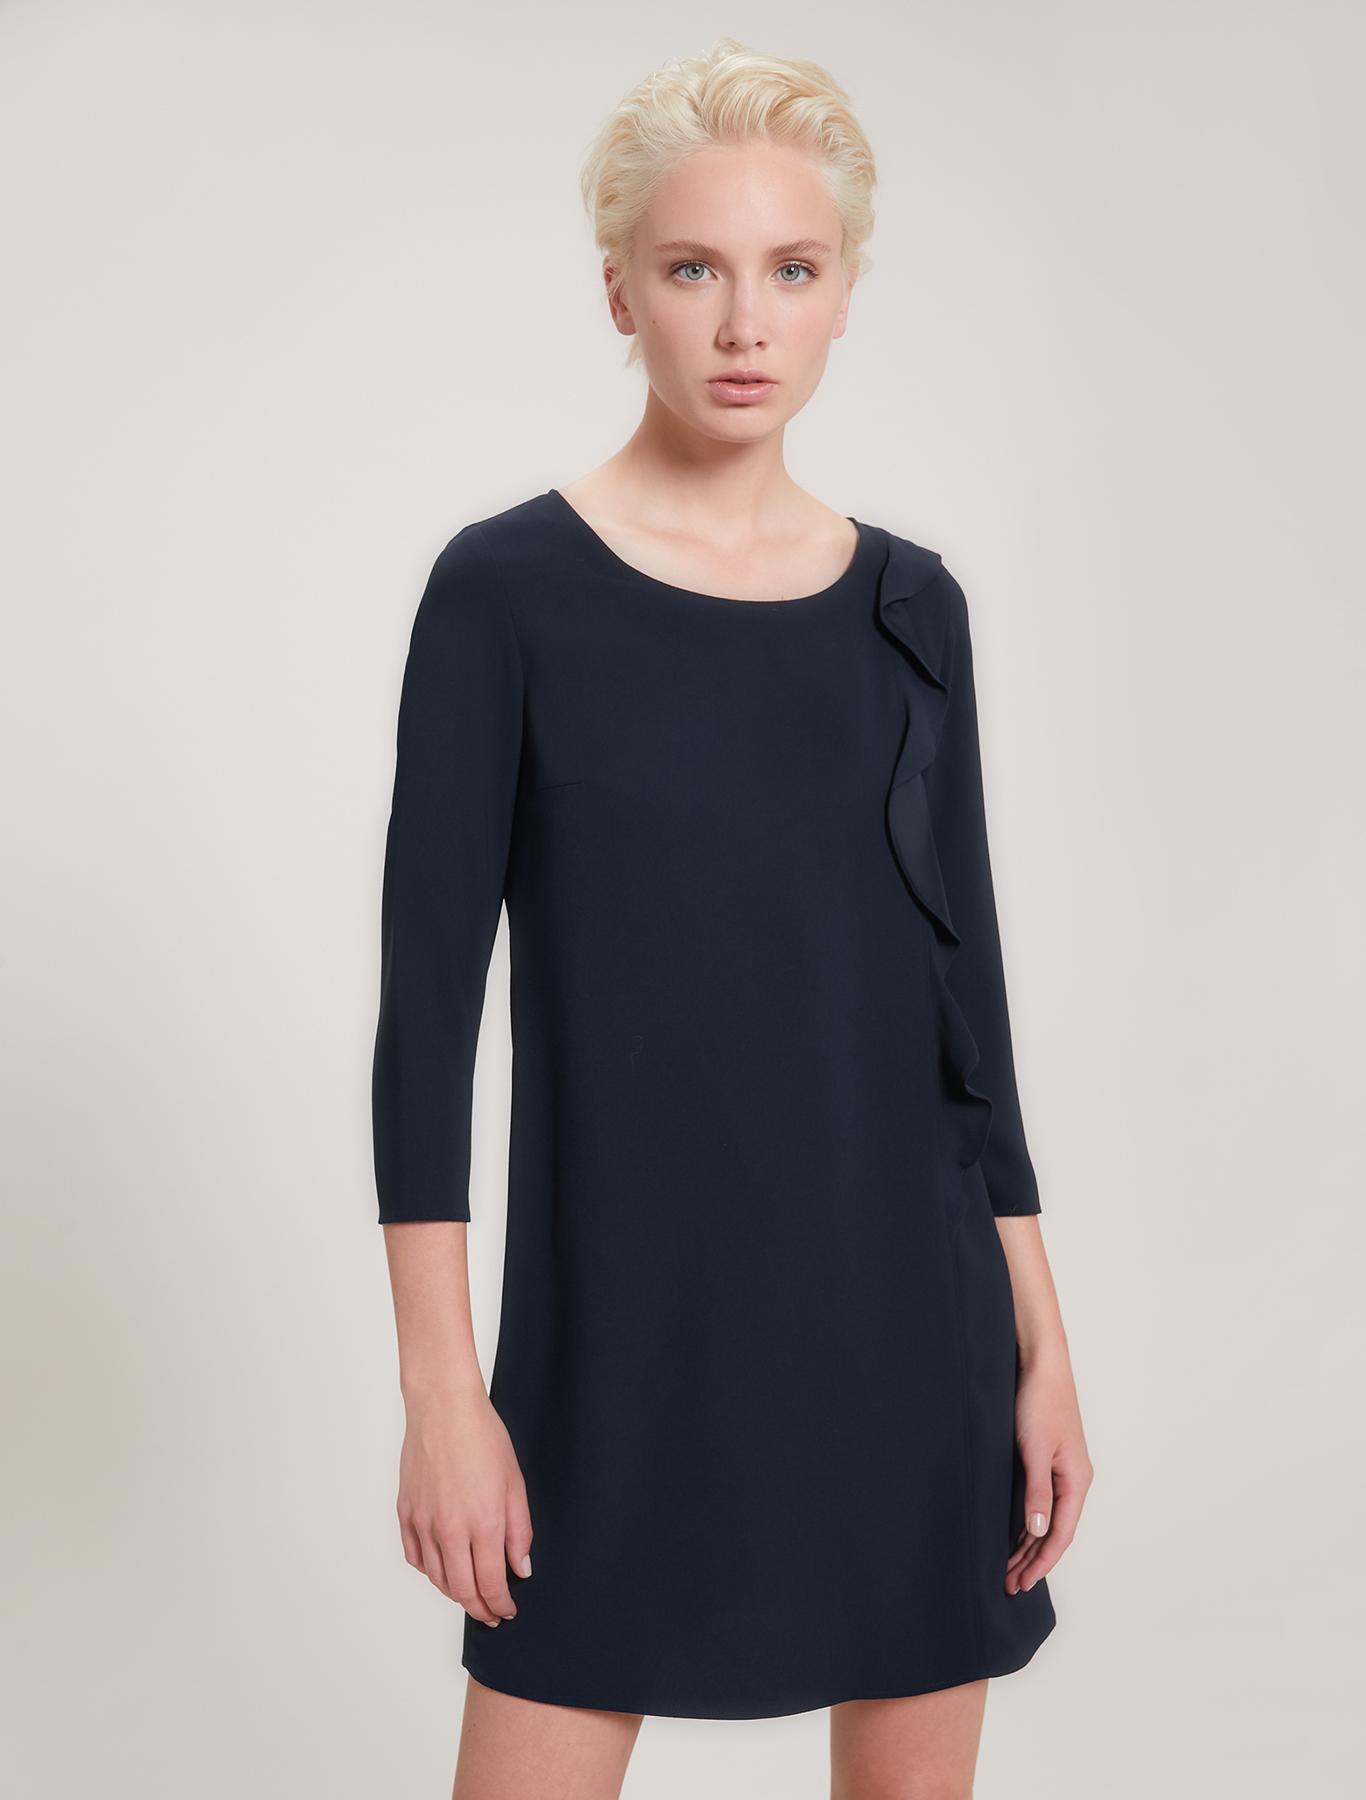 Envers satin dress with flounce - navy blue - pennyblack